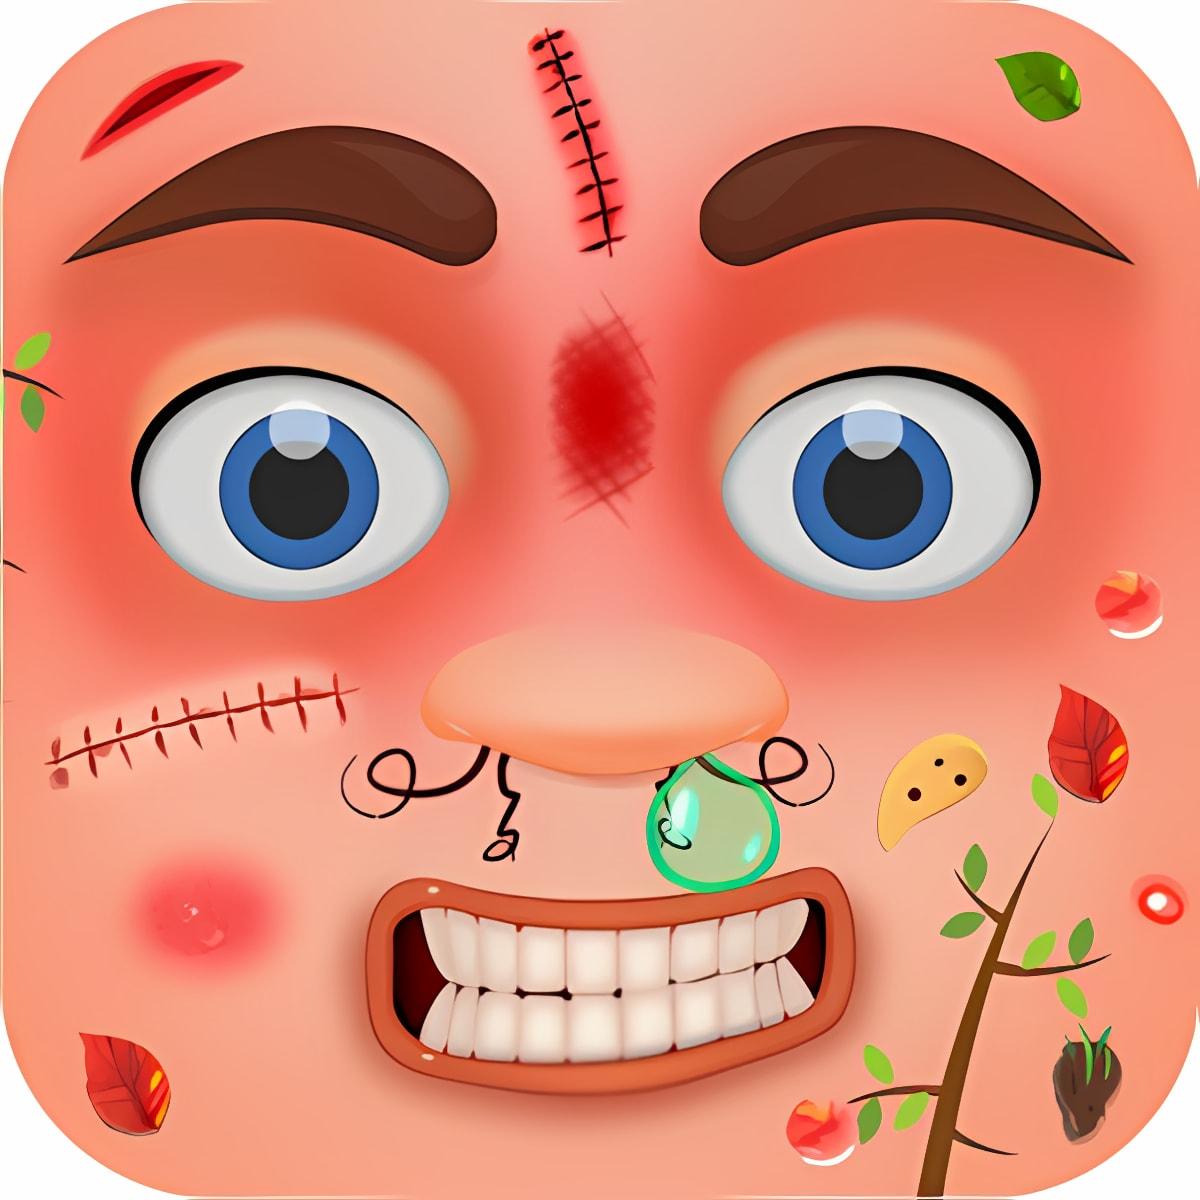 Médico Face - Juego Gratis Kid